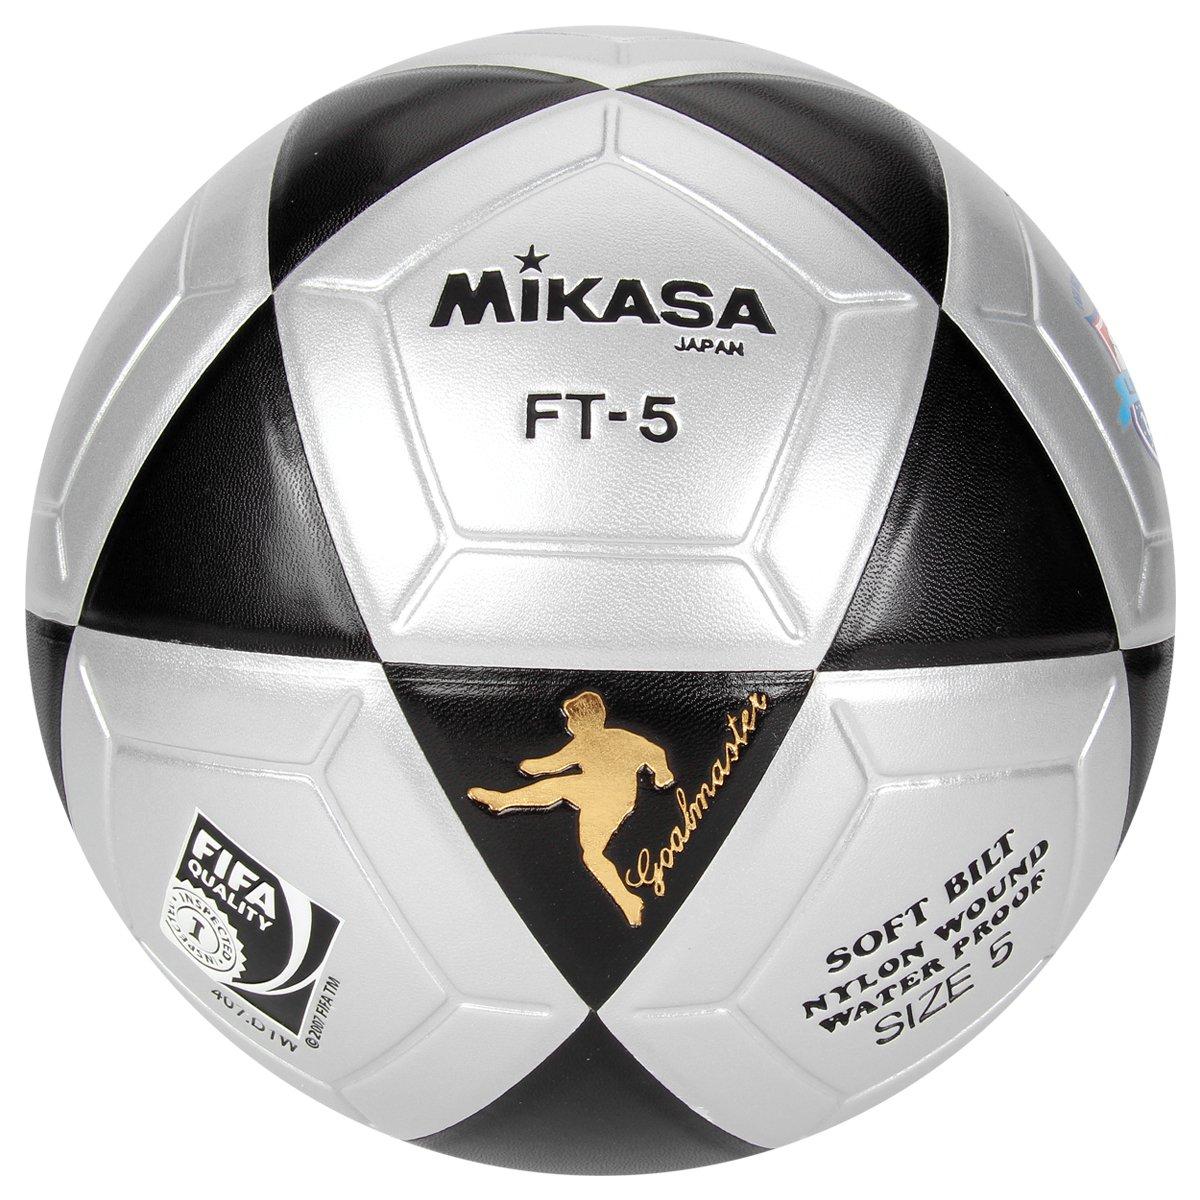 0dfe620106647 Bola Futebol Mikasa FT-5 Futvôlei - Prata e Preto - Compre Agora ...